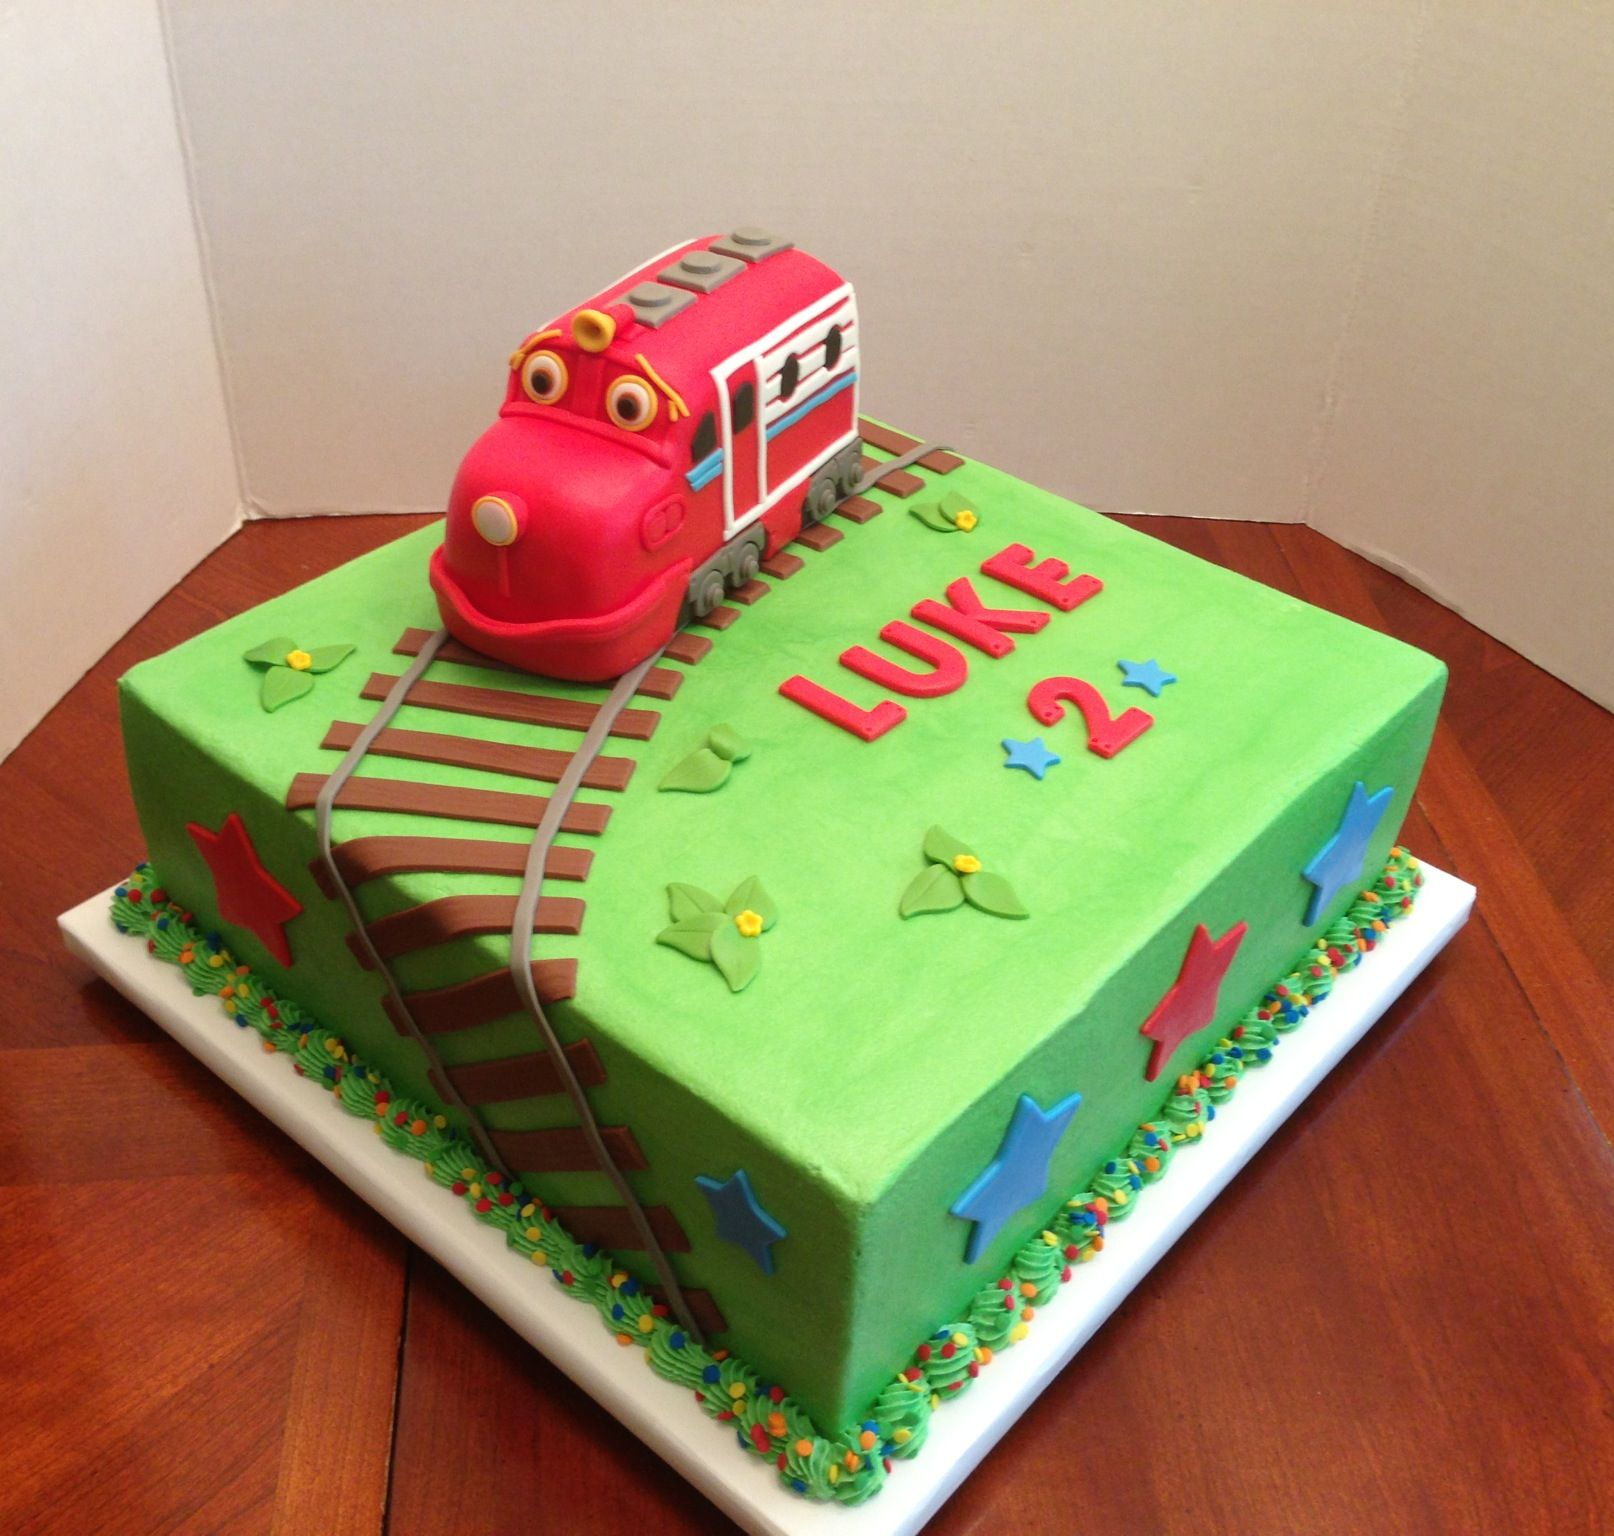 Chuggingtons cake Train made of rice cereal treats Karen Reeves